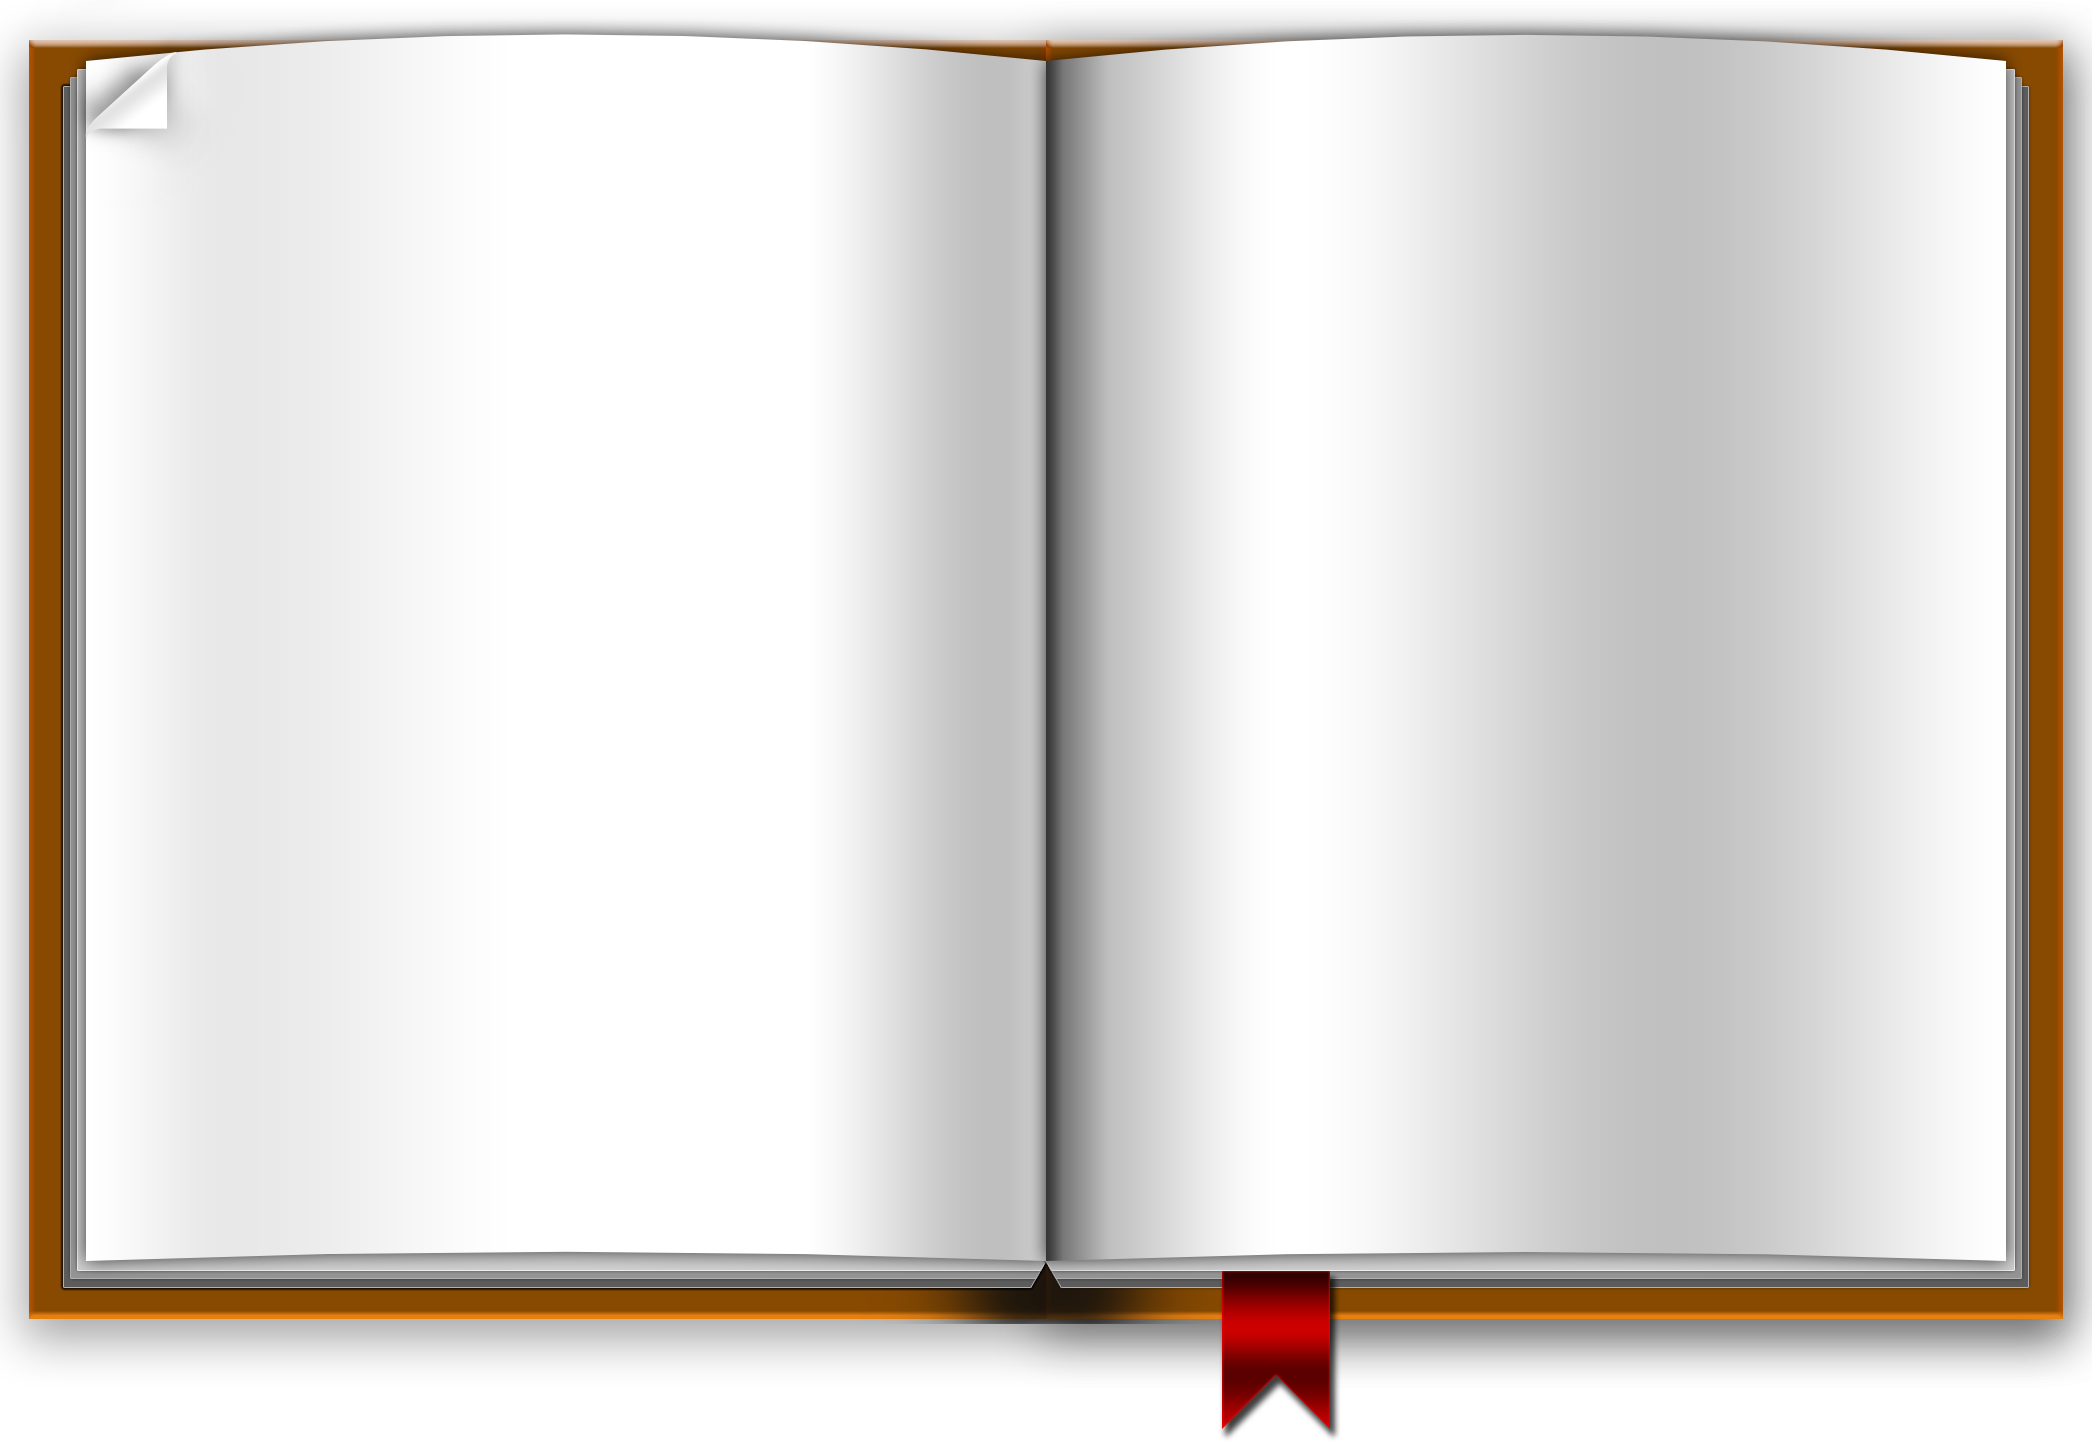 Книга картинка разворот